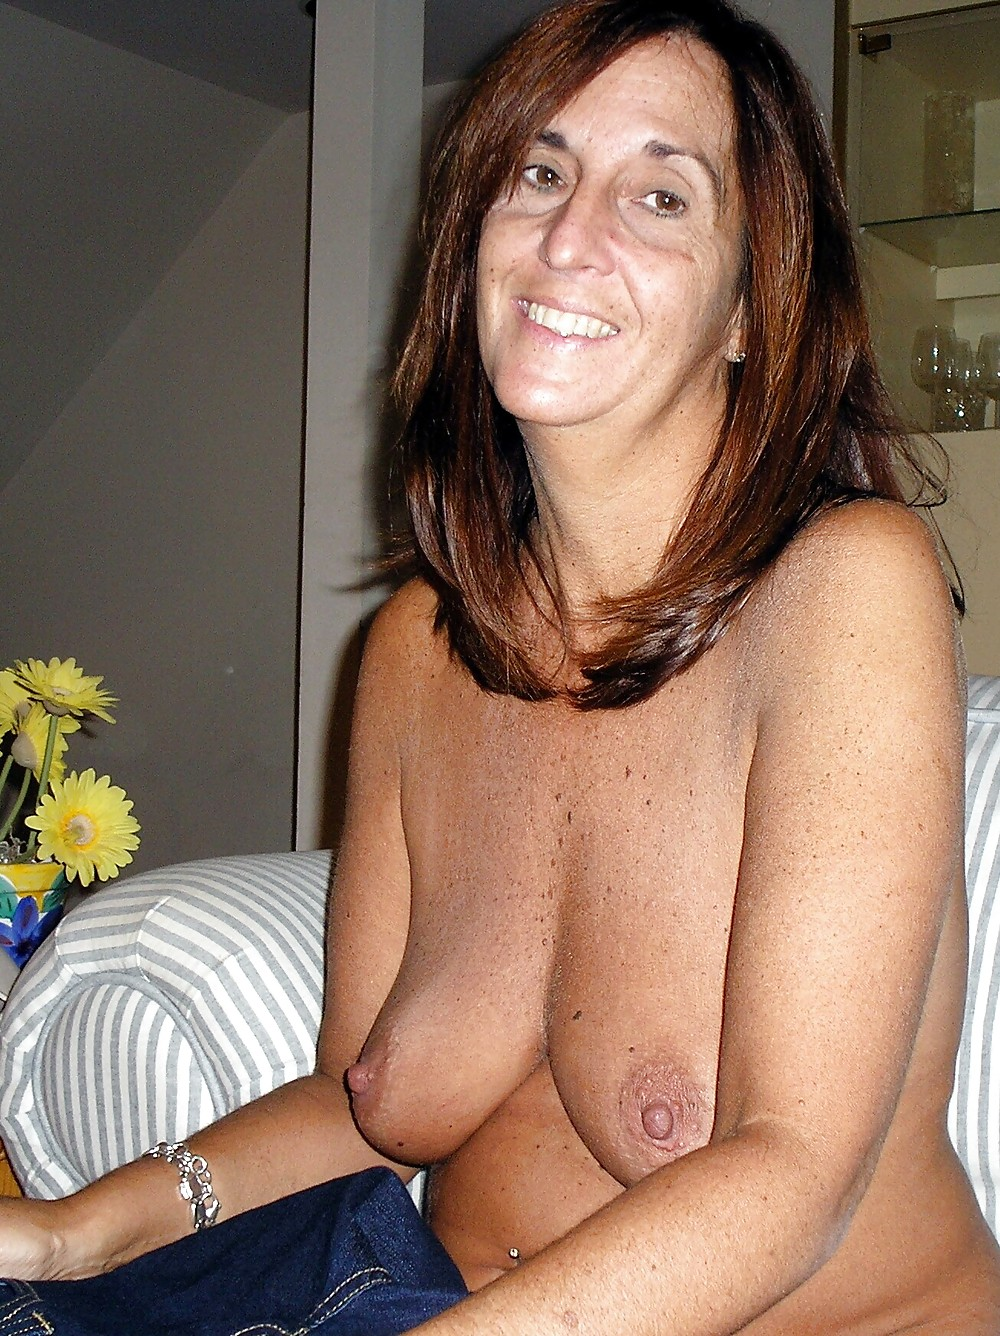 Freckled tits pics — img 12